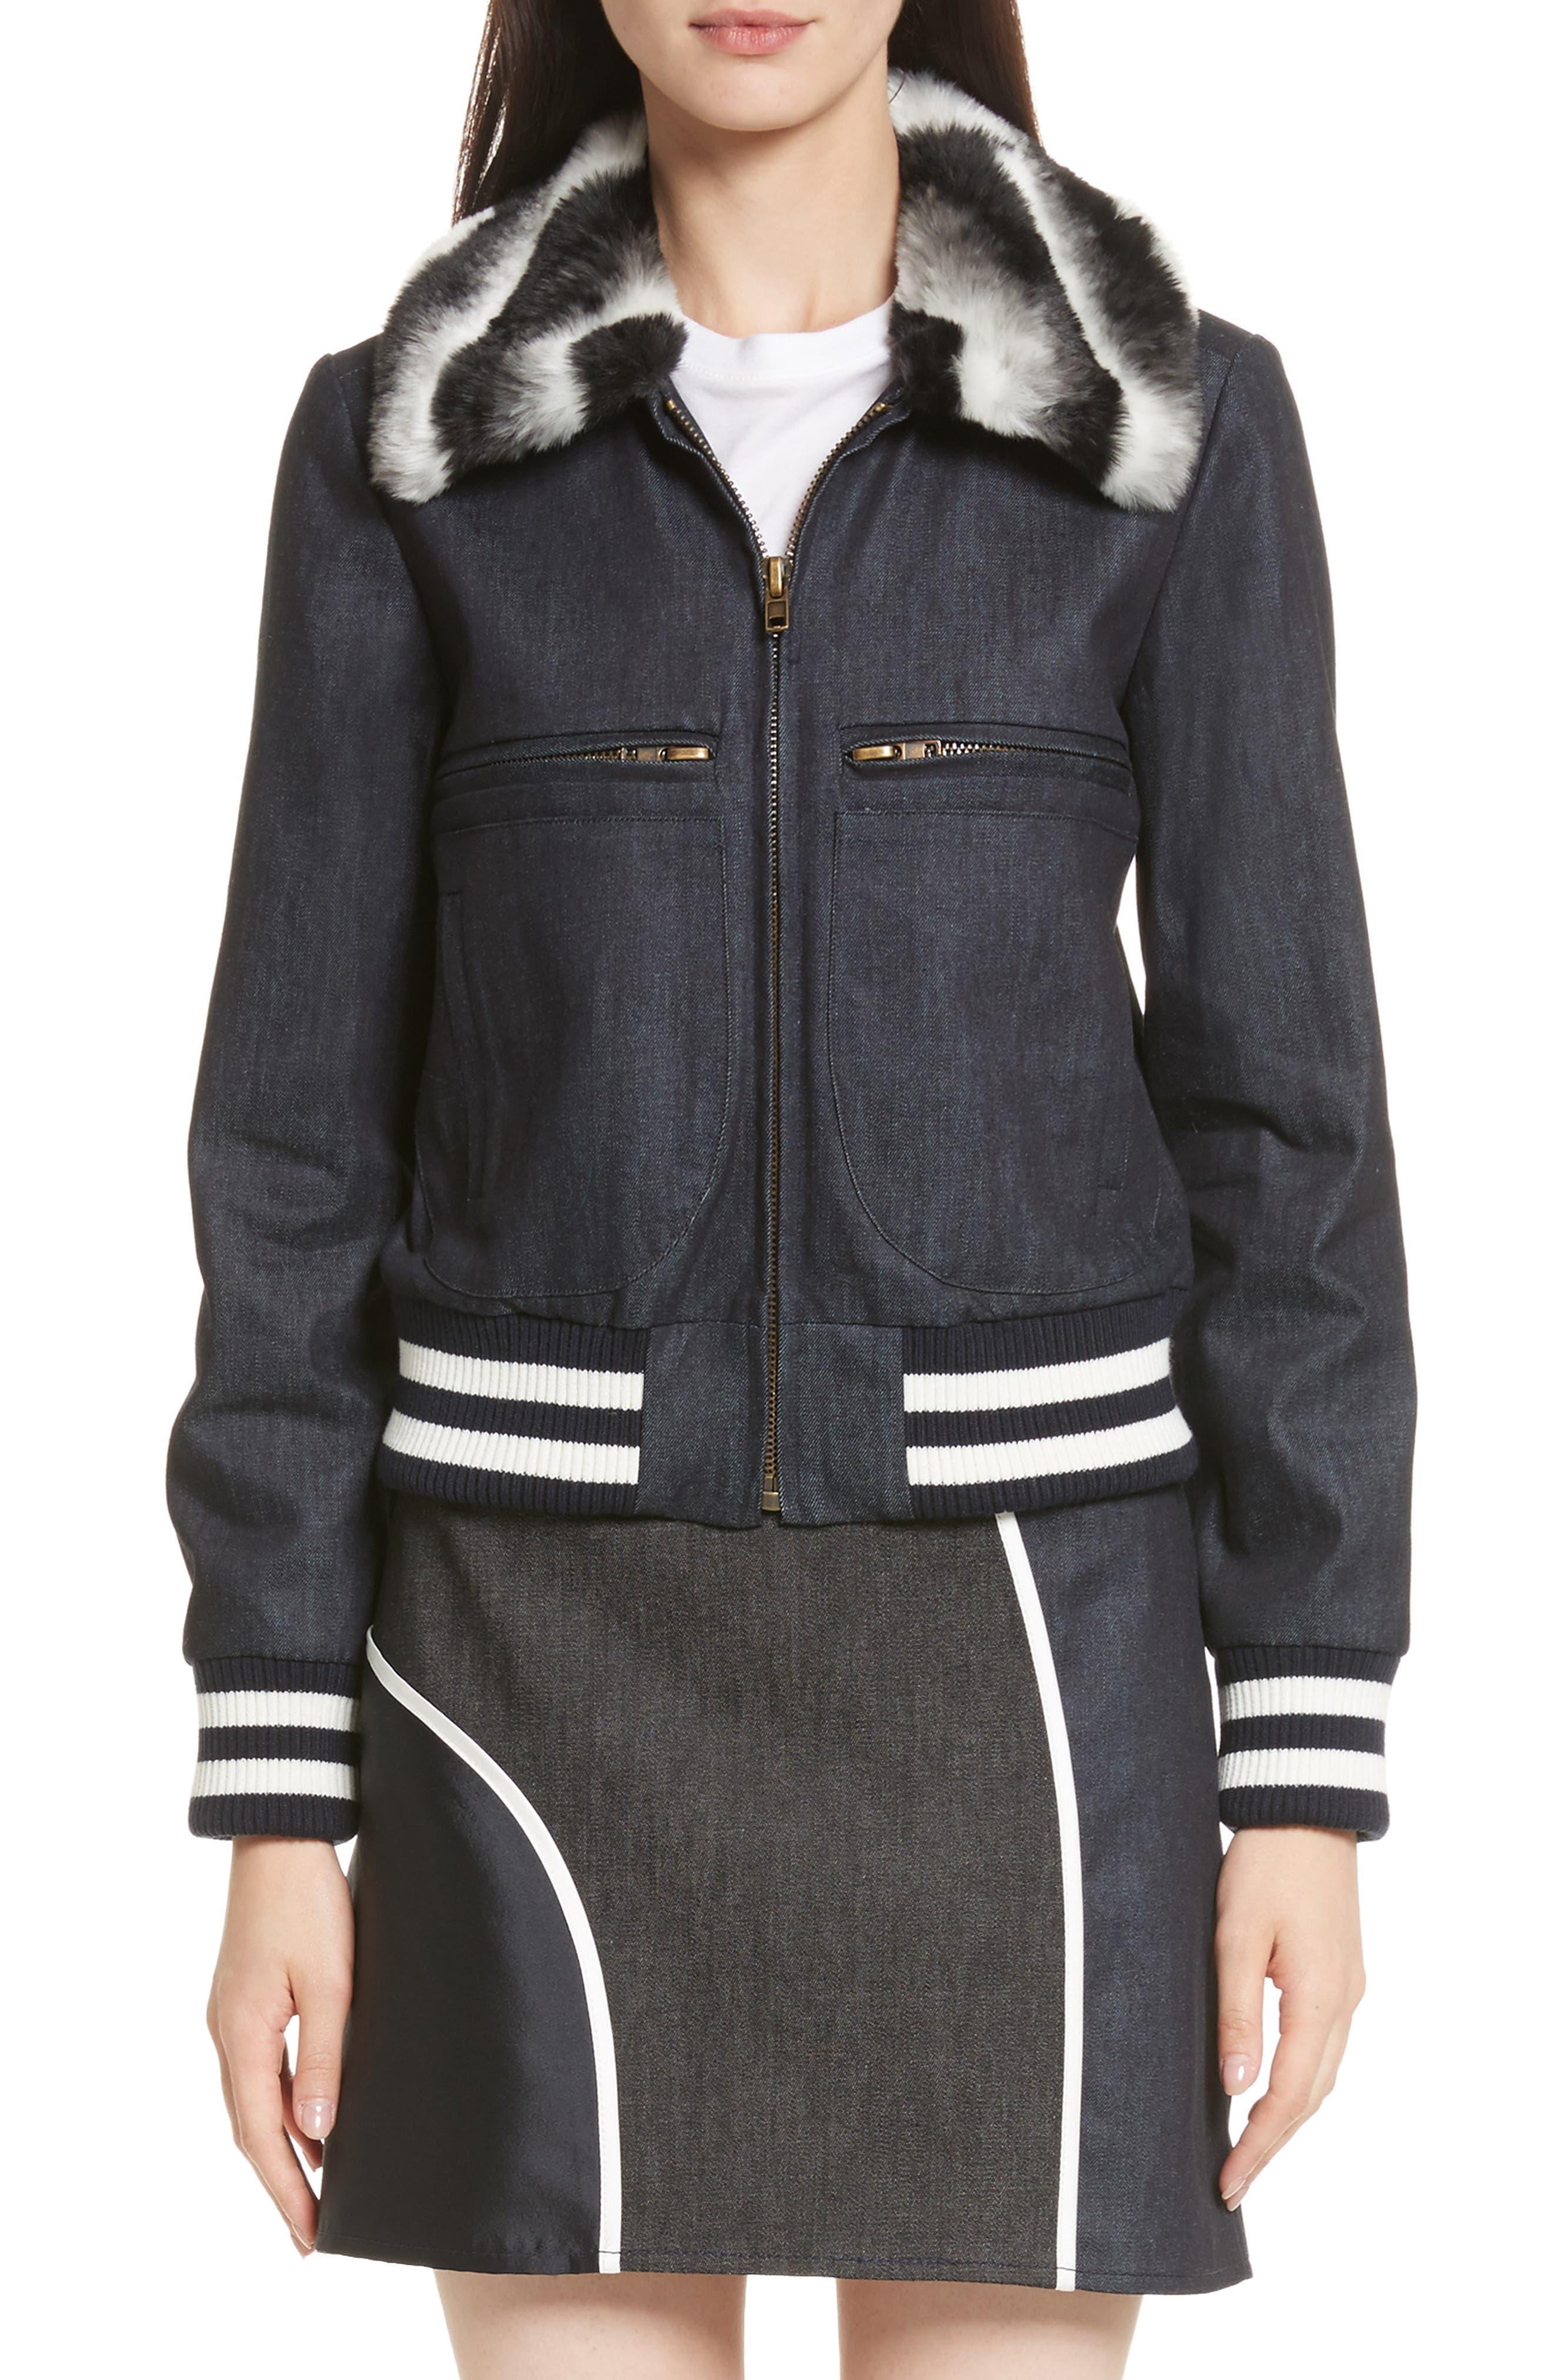 Alternate Image 1 Selected - Harvey Faircloth Faux Fur Collar Bomber Jacket